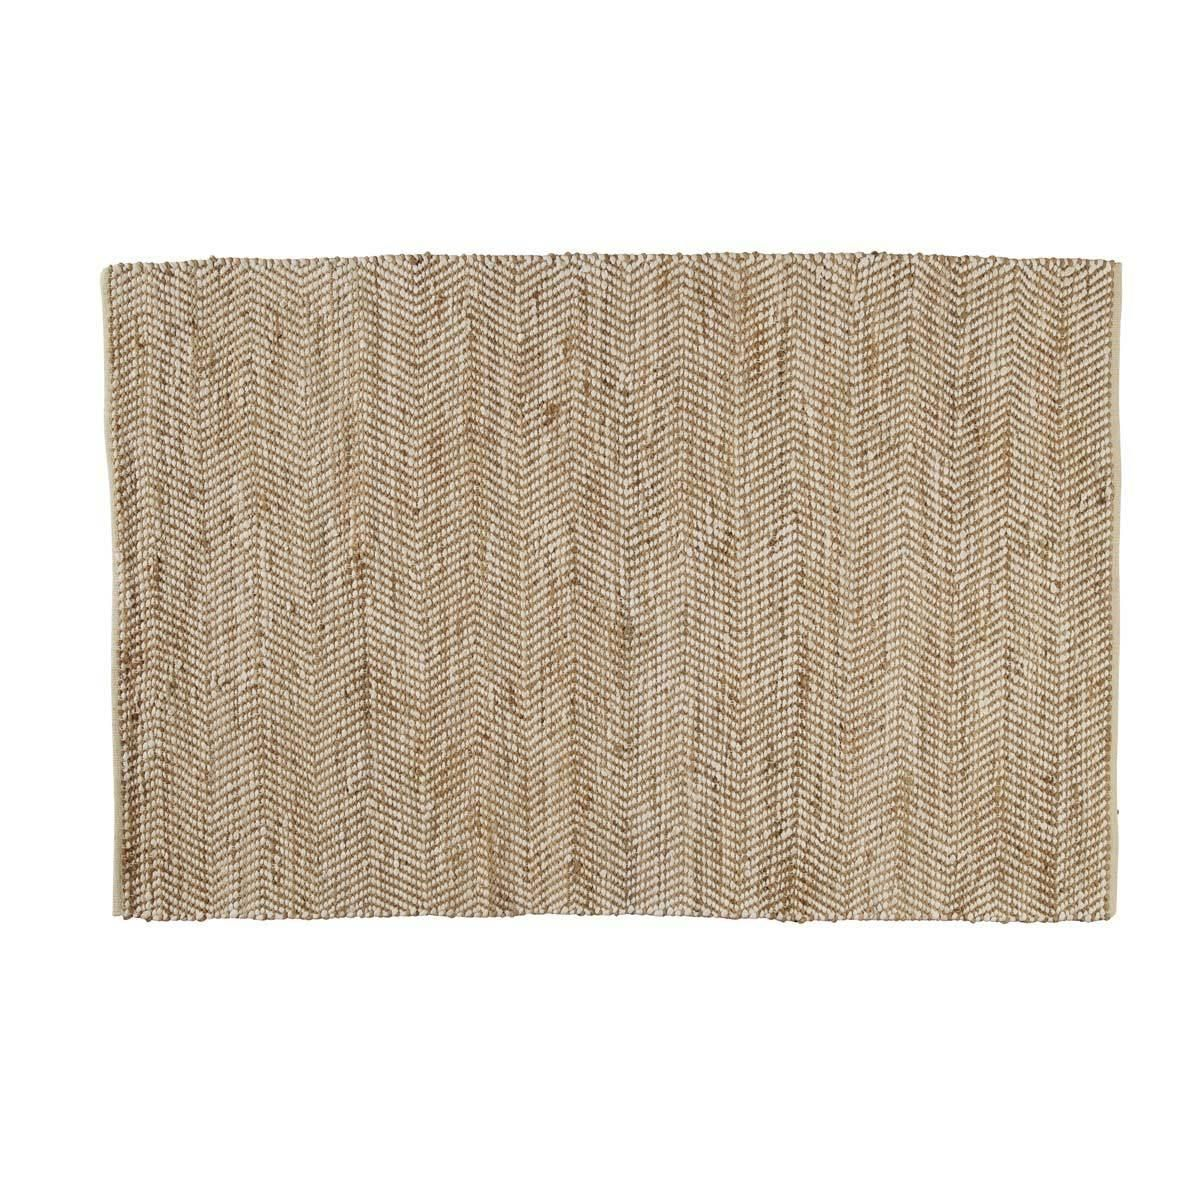 teppich aus baumwolle und jute 140 x 200 cm jute paint. Black Bedroom Furniture Sets. Home Design Ideas